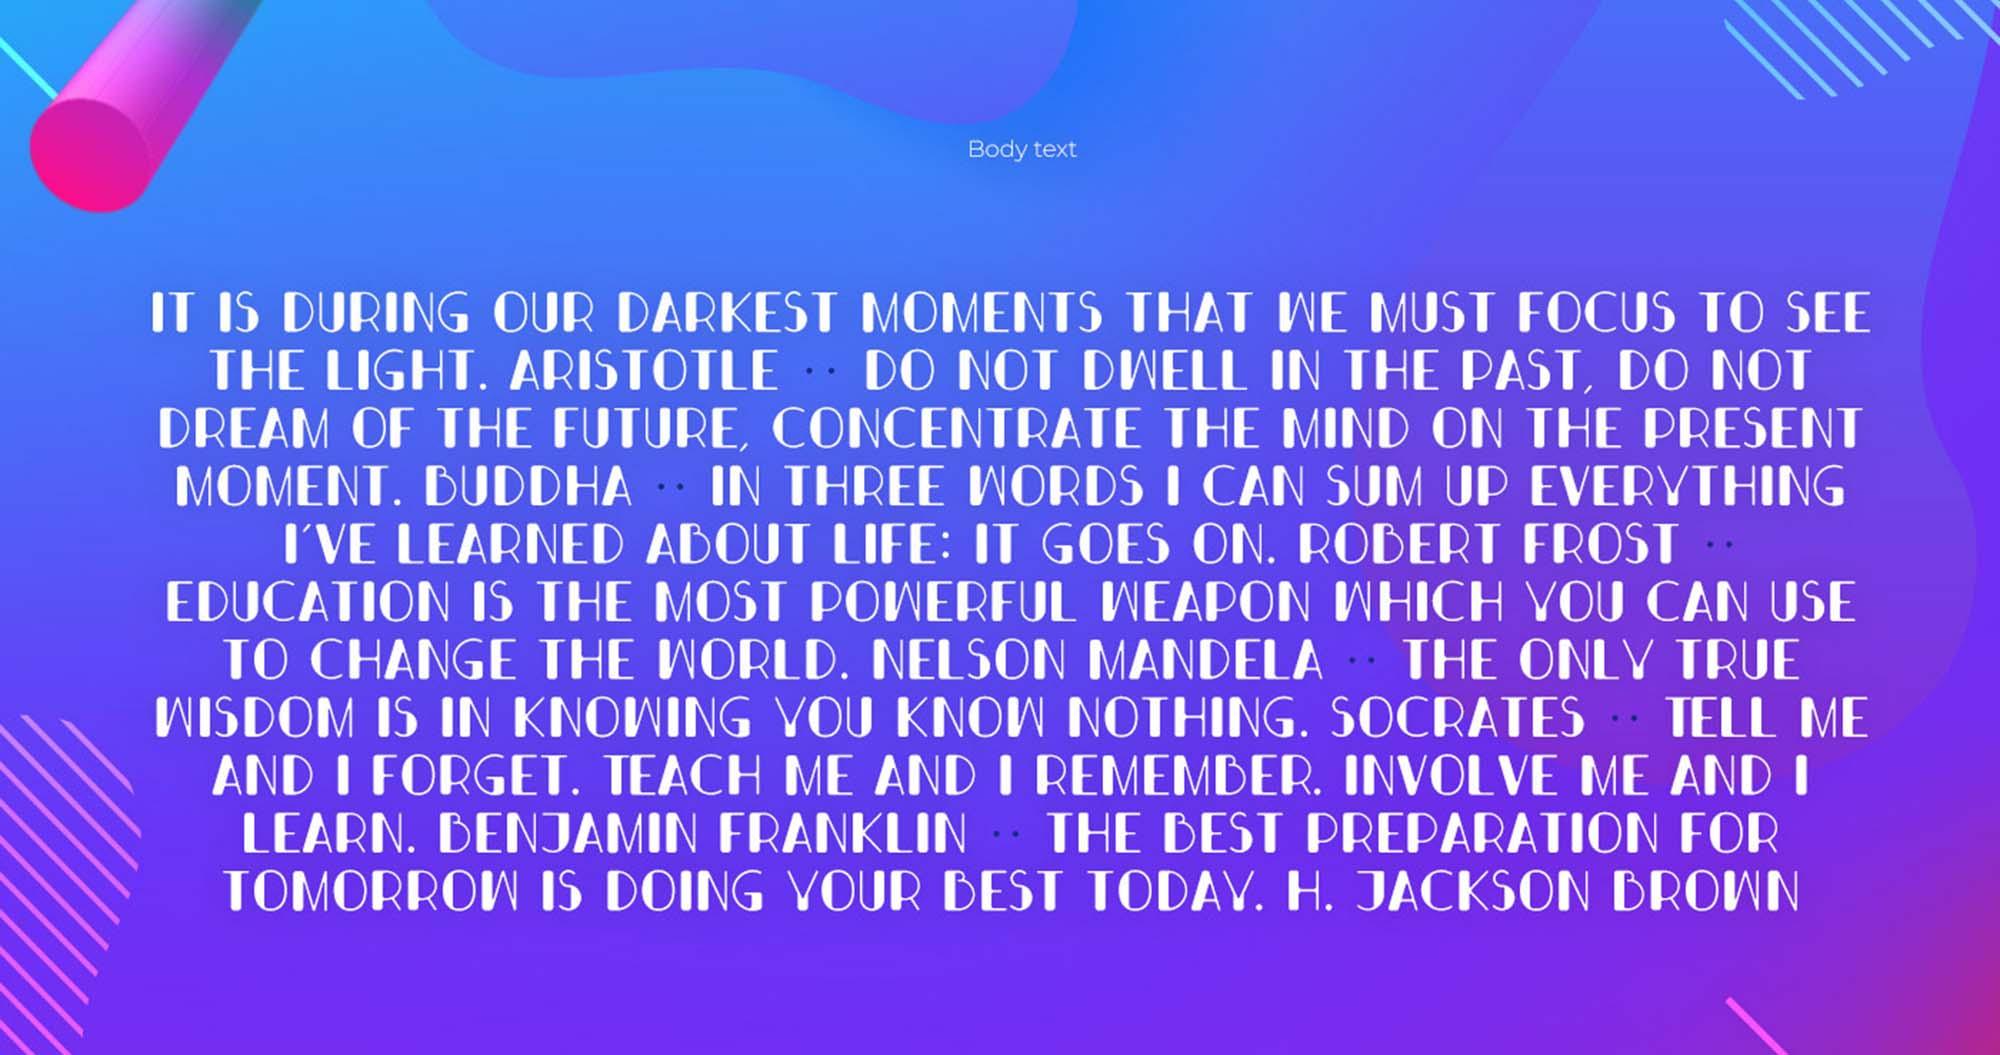 Bondi Font Body Text